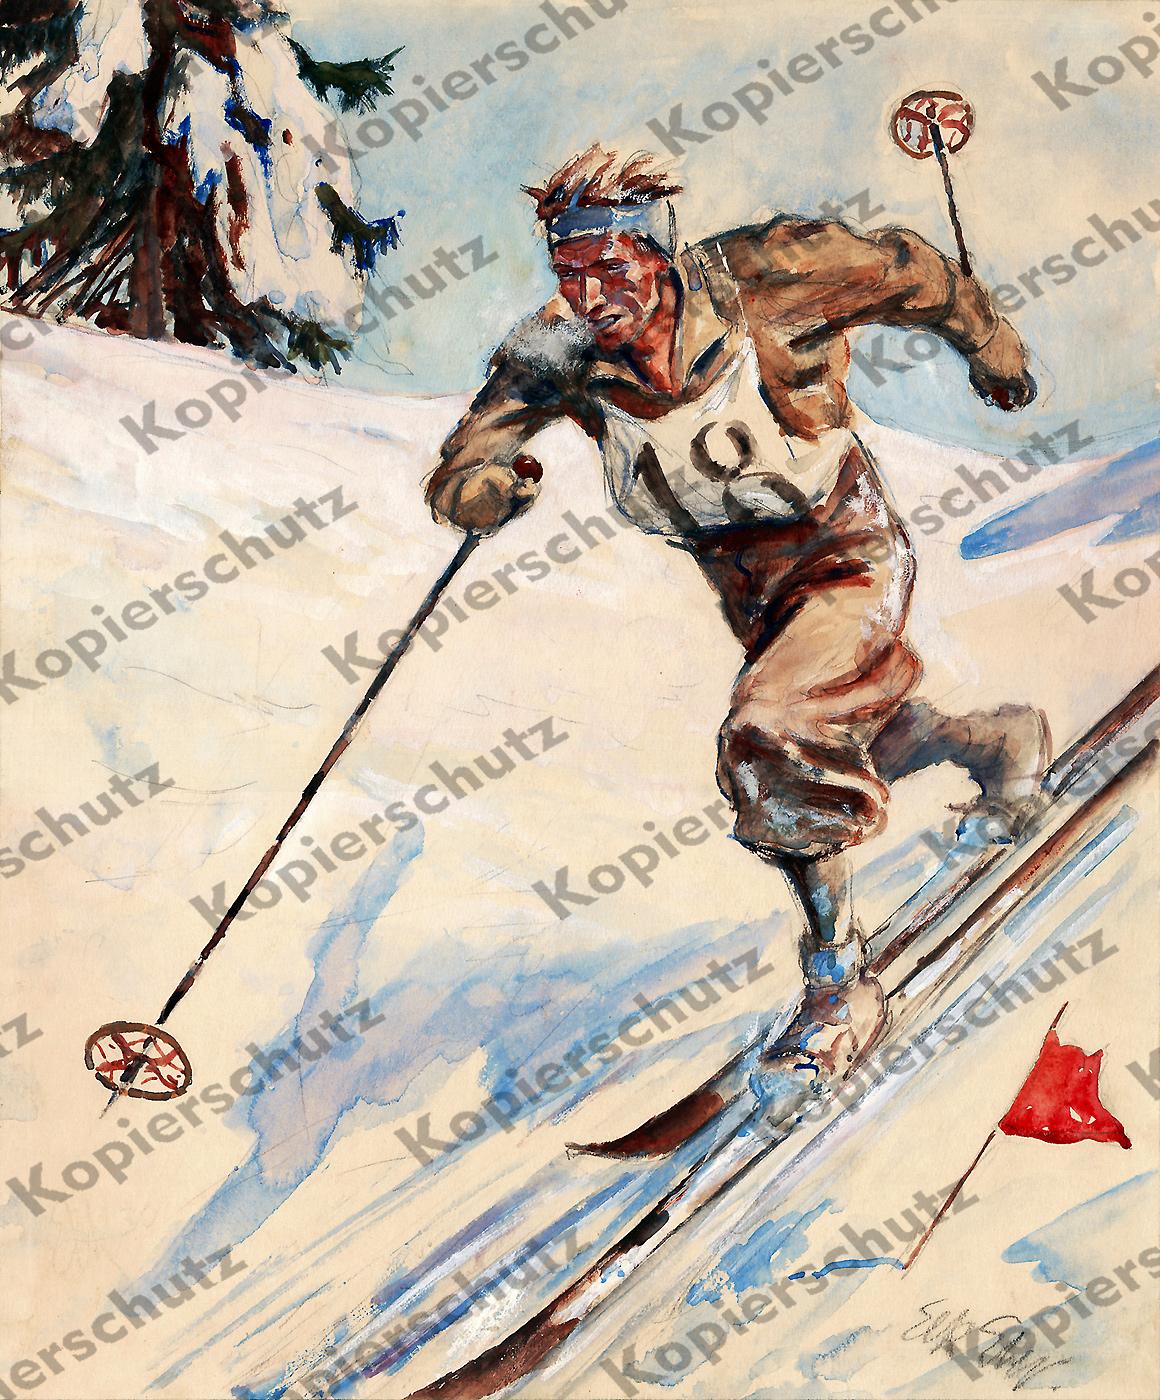 Winterolympiade datiert